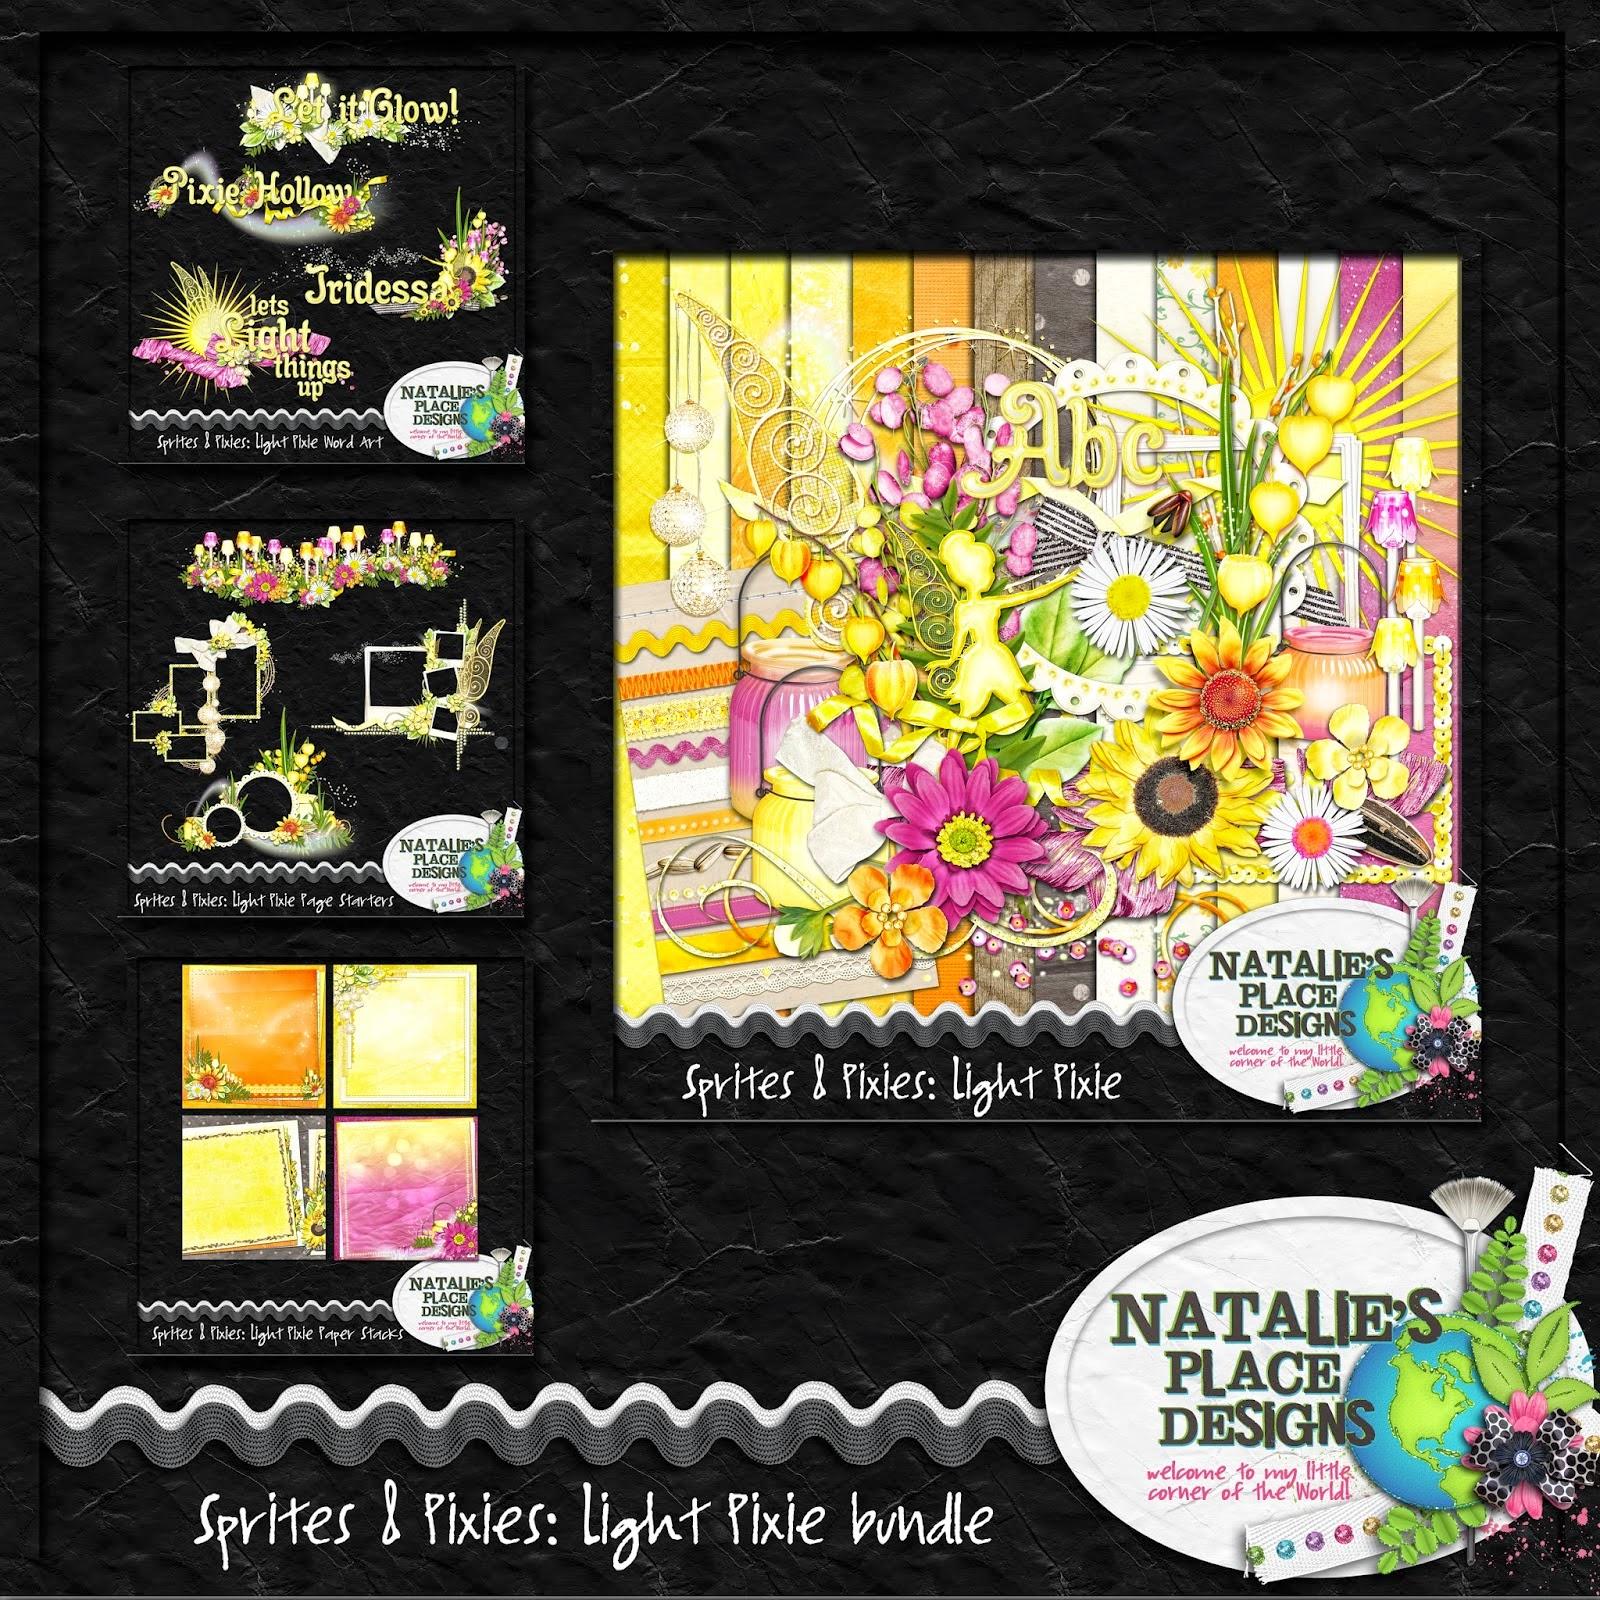 http://www.nataliesplacedesigns.com/store/p485/Sprites_%26_Pixies%3A_Light_Pixie_Bundle.html